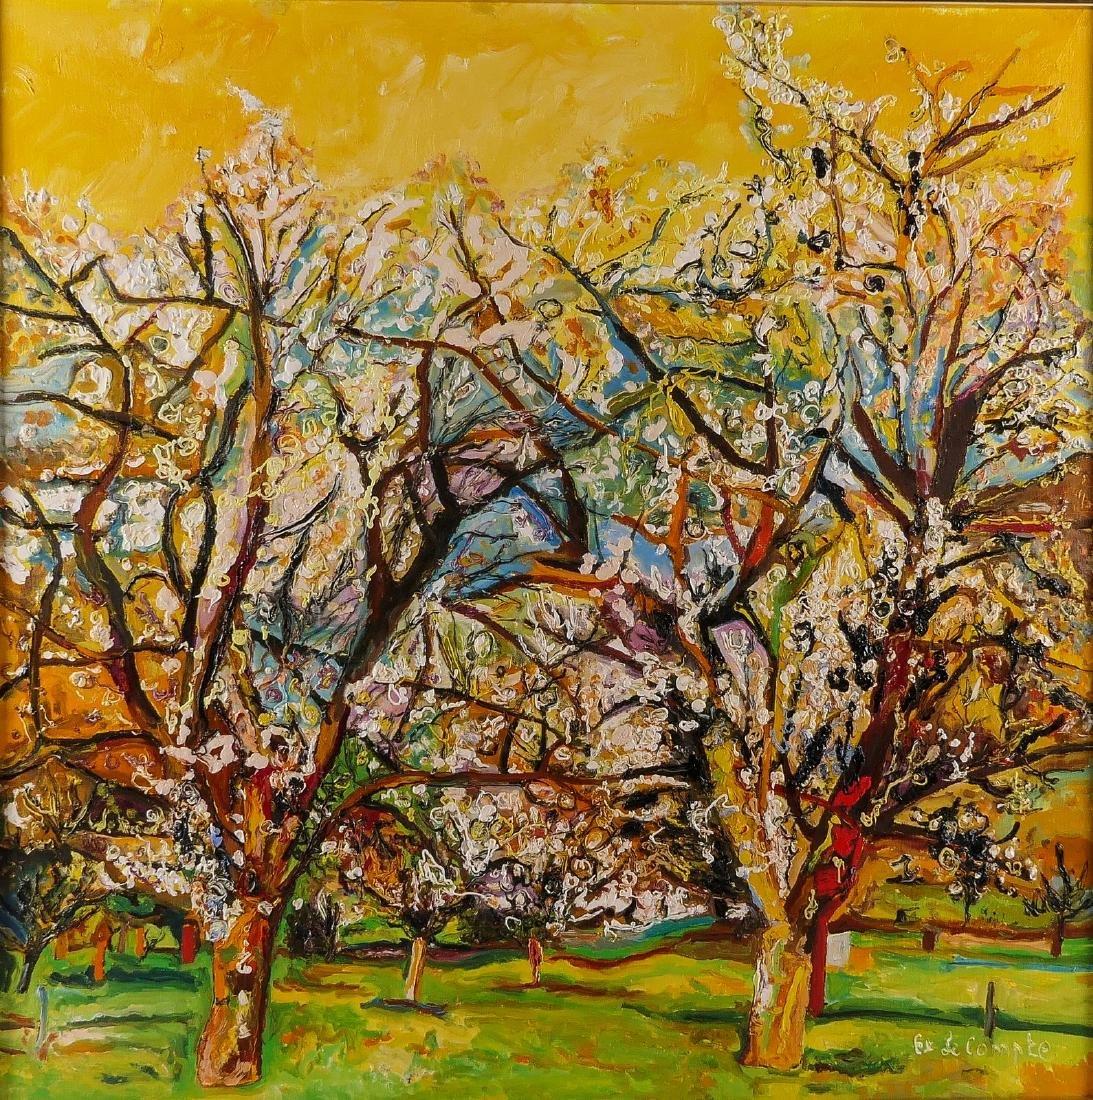 Le Compte E., 'Molenberg', oil on canvas, 100 x 100 cm